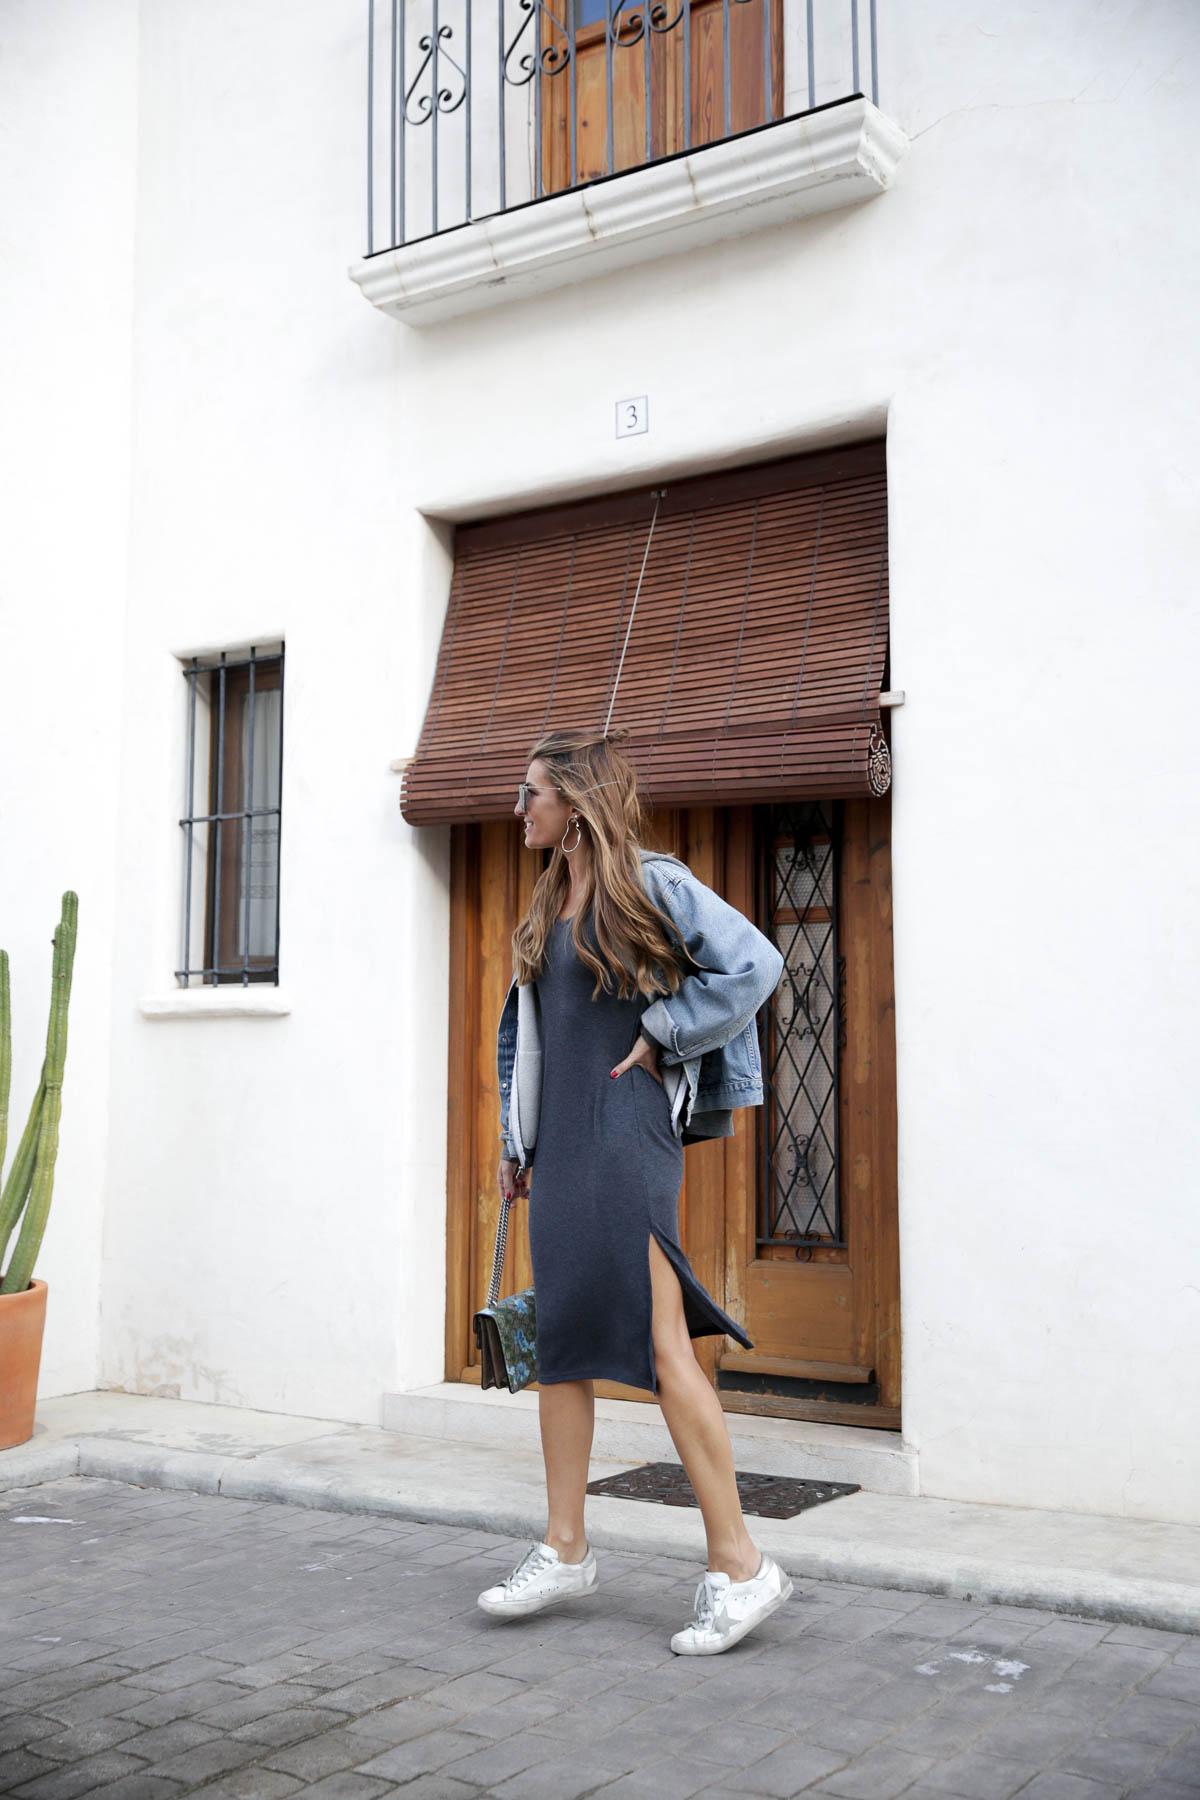 black-friday-a-bicyclette-sweatshirt-hoodie-all-star-leather-piel-cuero-celine-bag-bolso-mini-skirt-falda-streetstyle-look-bartabac-outfit-moda-blogger-2